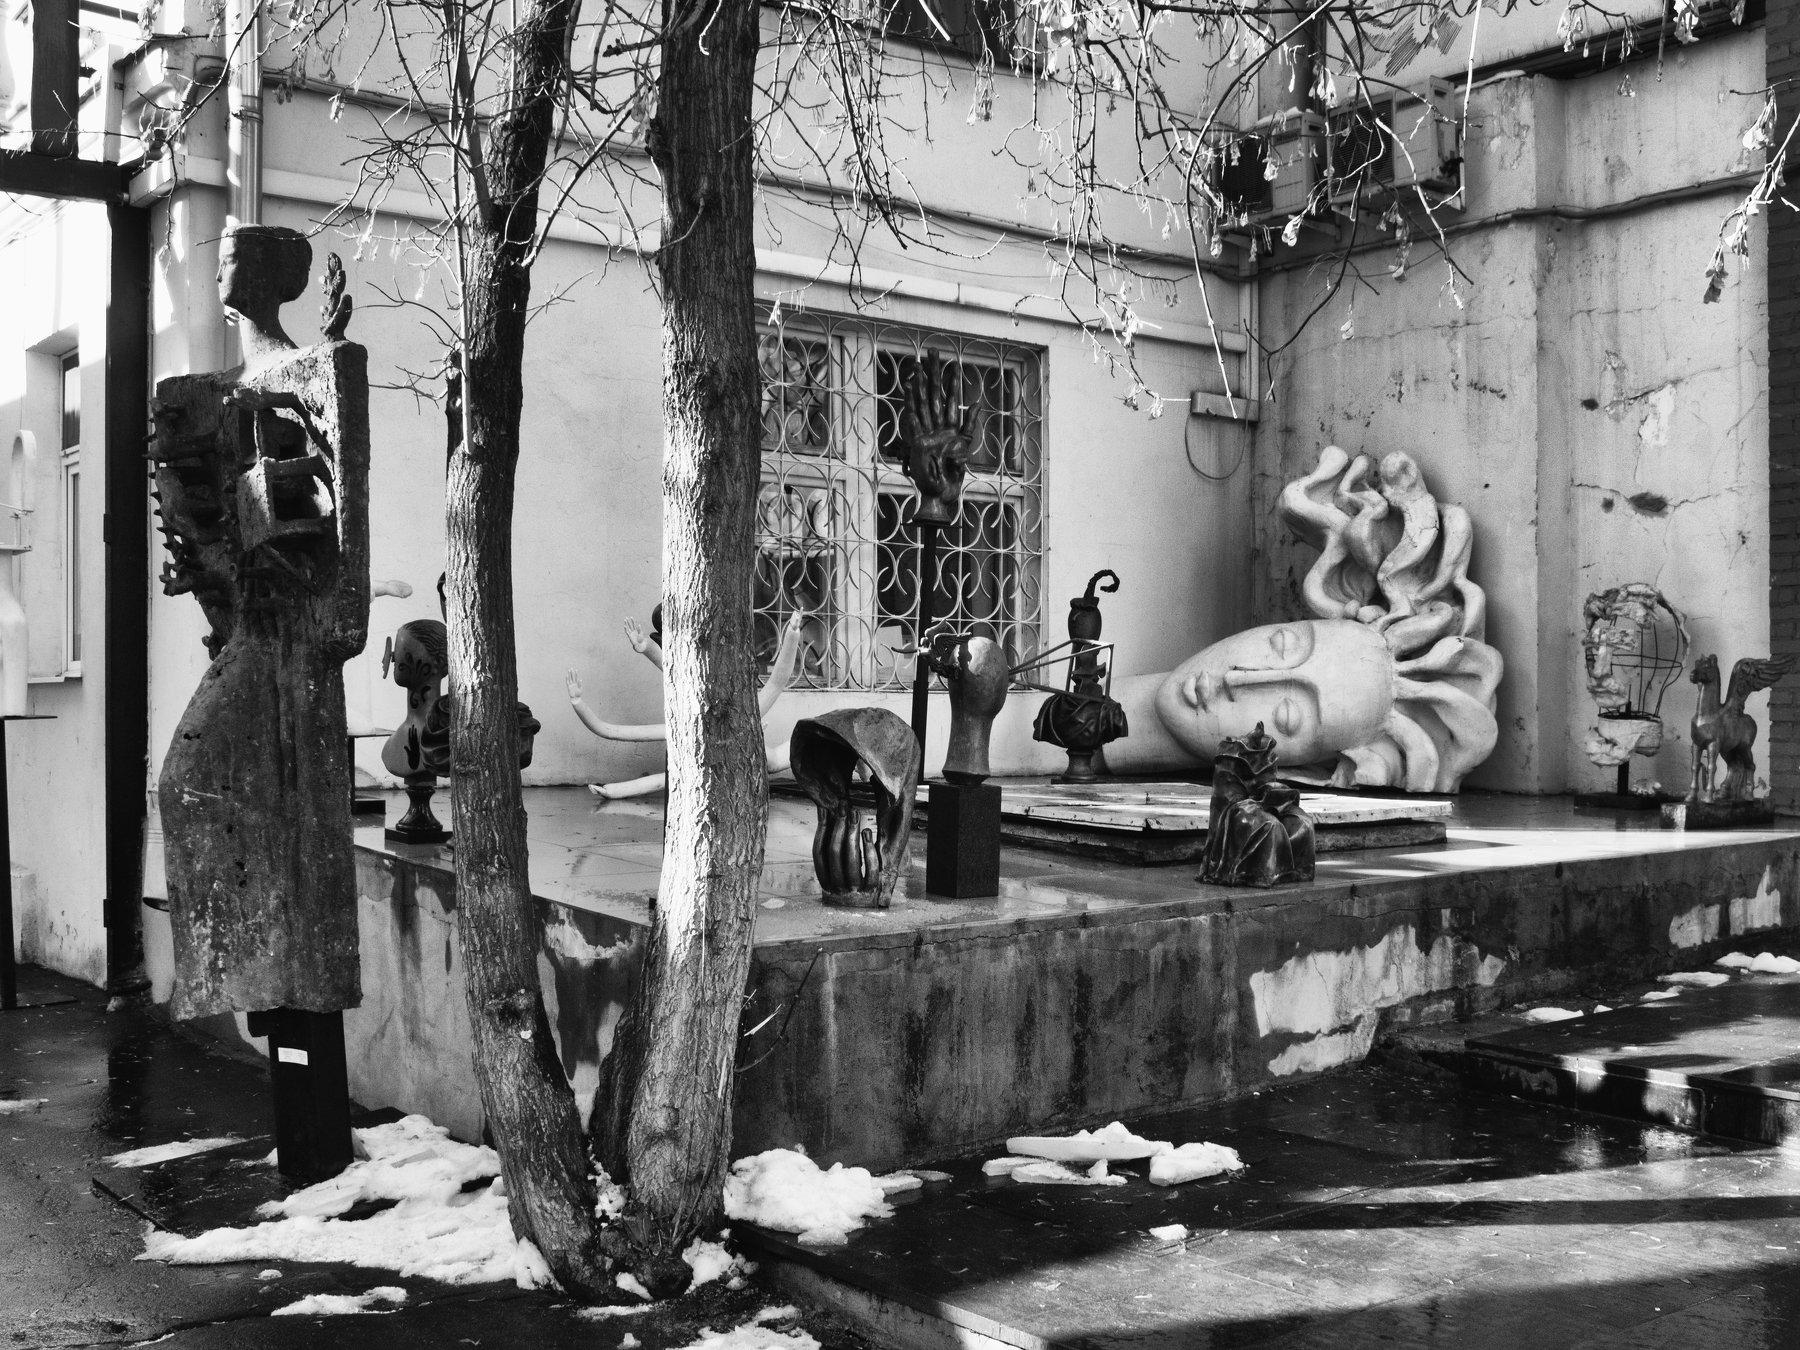 Moscow, Russia, Black and white, Monochrome, Surrealism, Sculpture, Museum, Elena Beregatnova